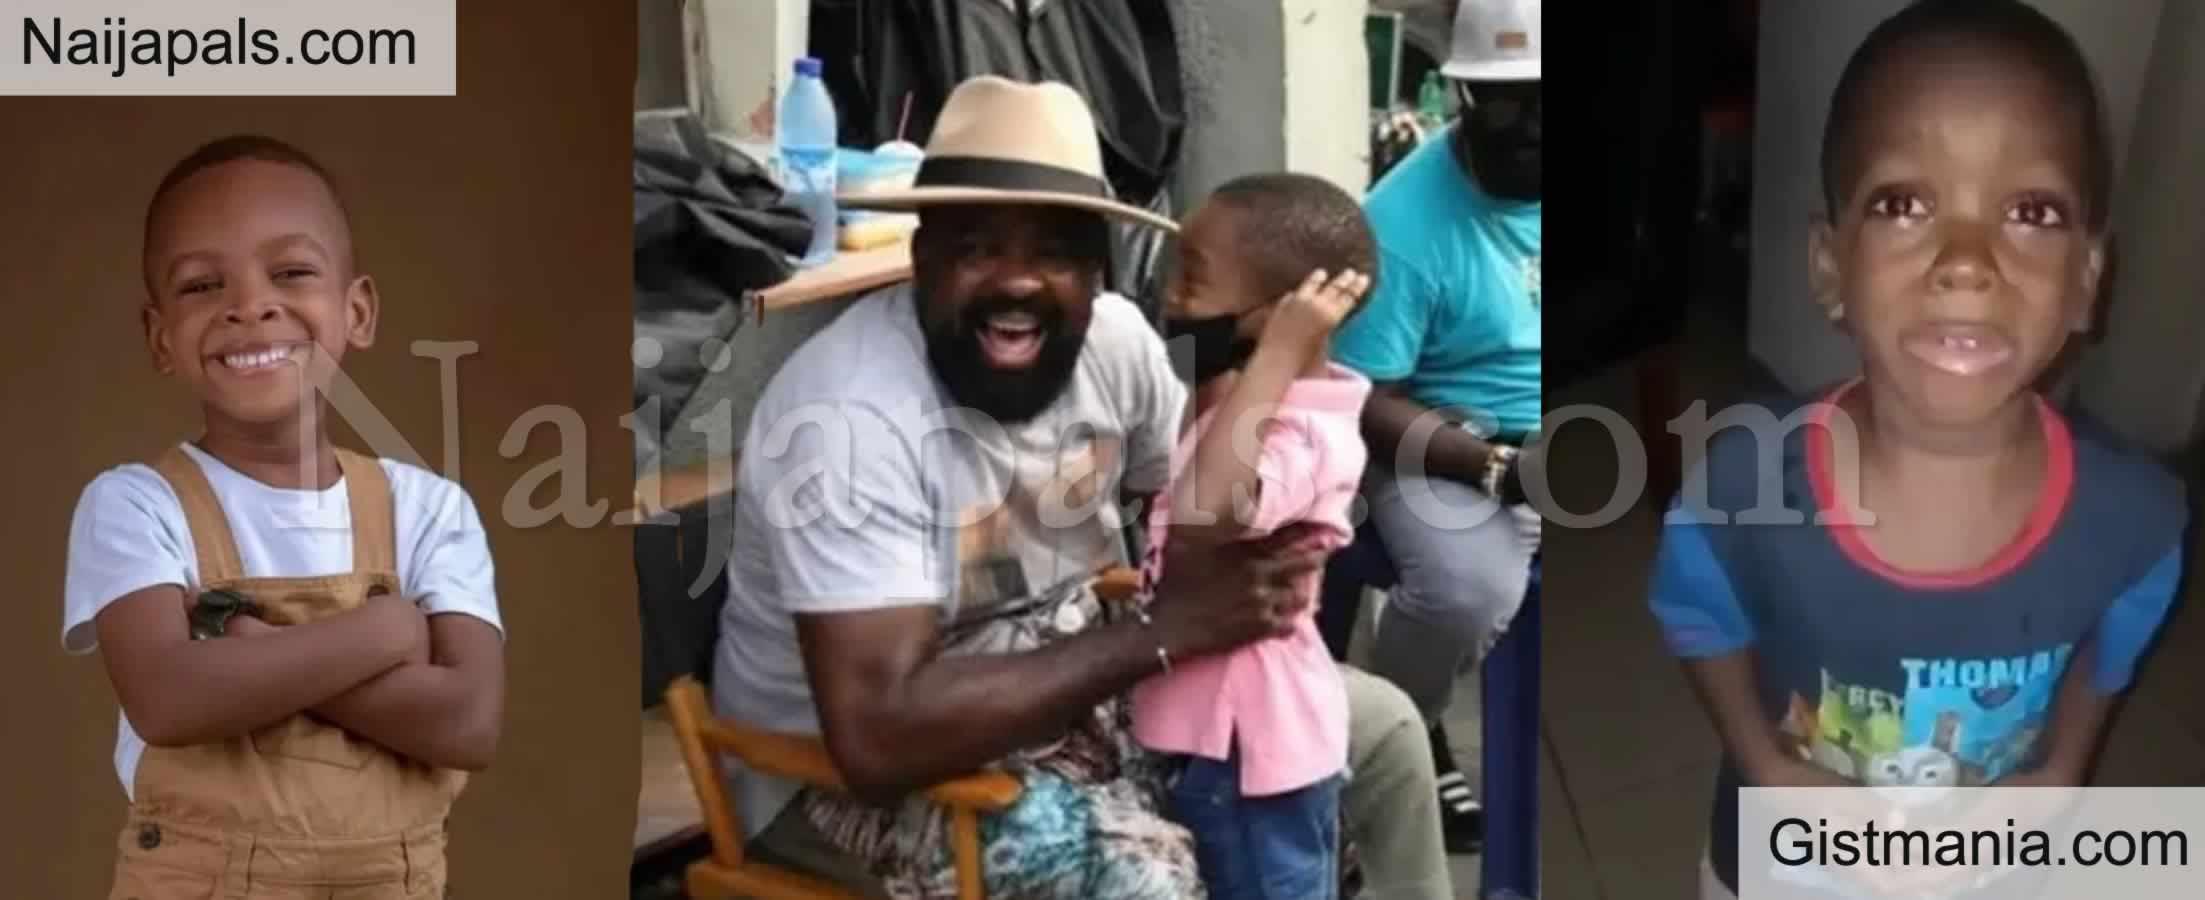 "<img alt='.' class='lazyload' data-src='https://img.gistmania.com/emot/photo.png' /> <b>Nigerian Boy ""Mummy Calm Down"" Makes Nollywood Debut In Kunle Afolayan Movie</b> (Photos)"